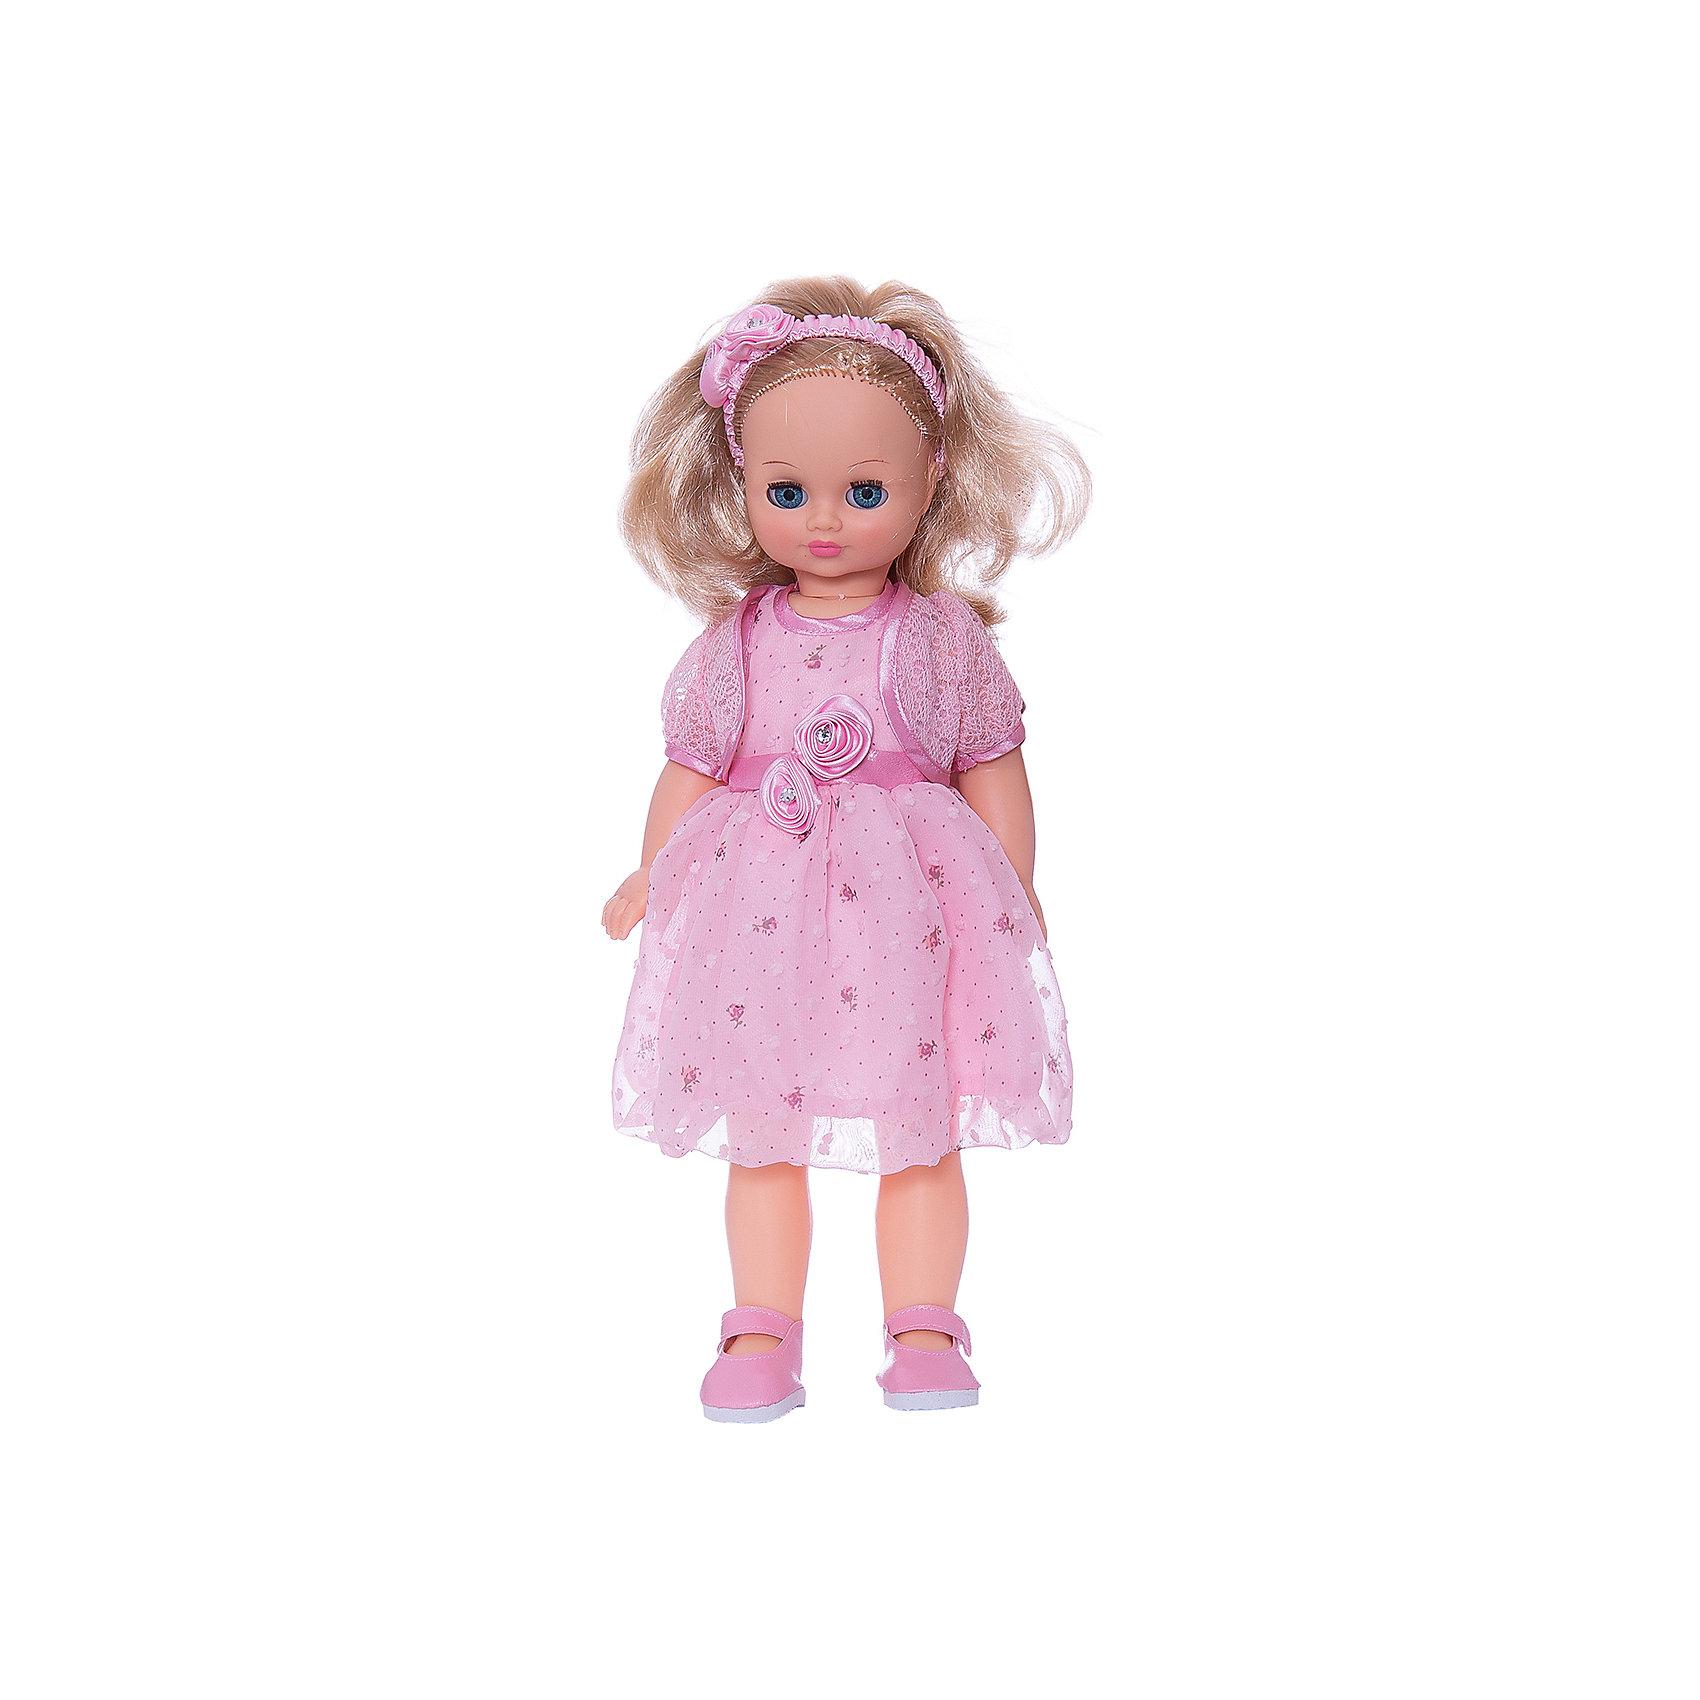 Весна Кукла Лиза 23, со звуком, Весна кукла весна алсу 35 см со звуком в1634 о